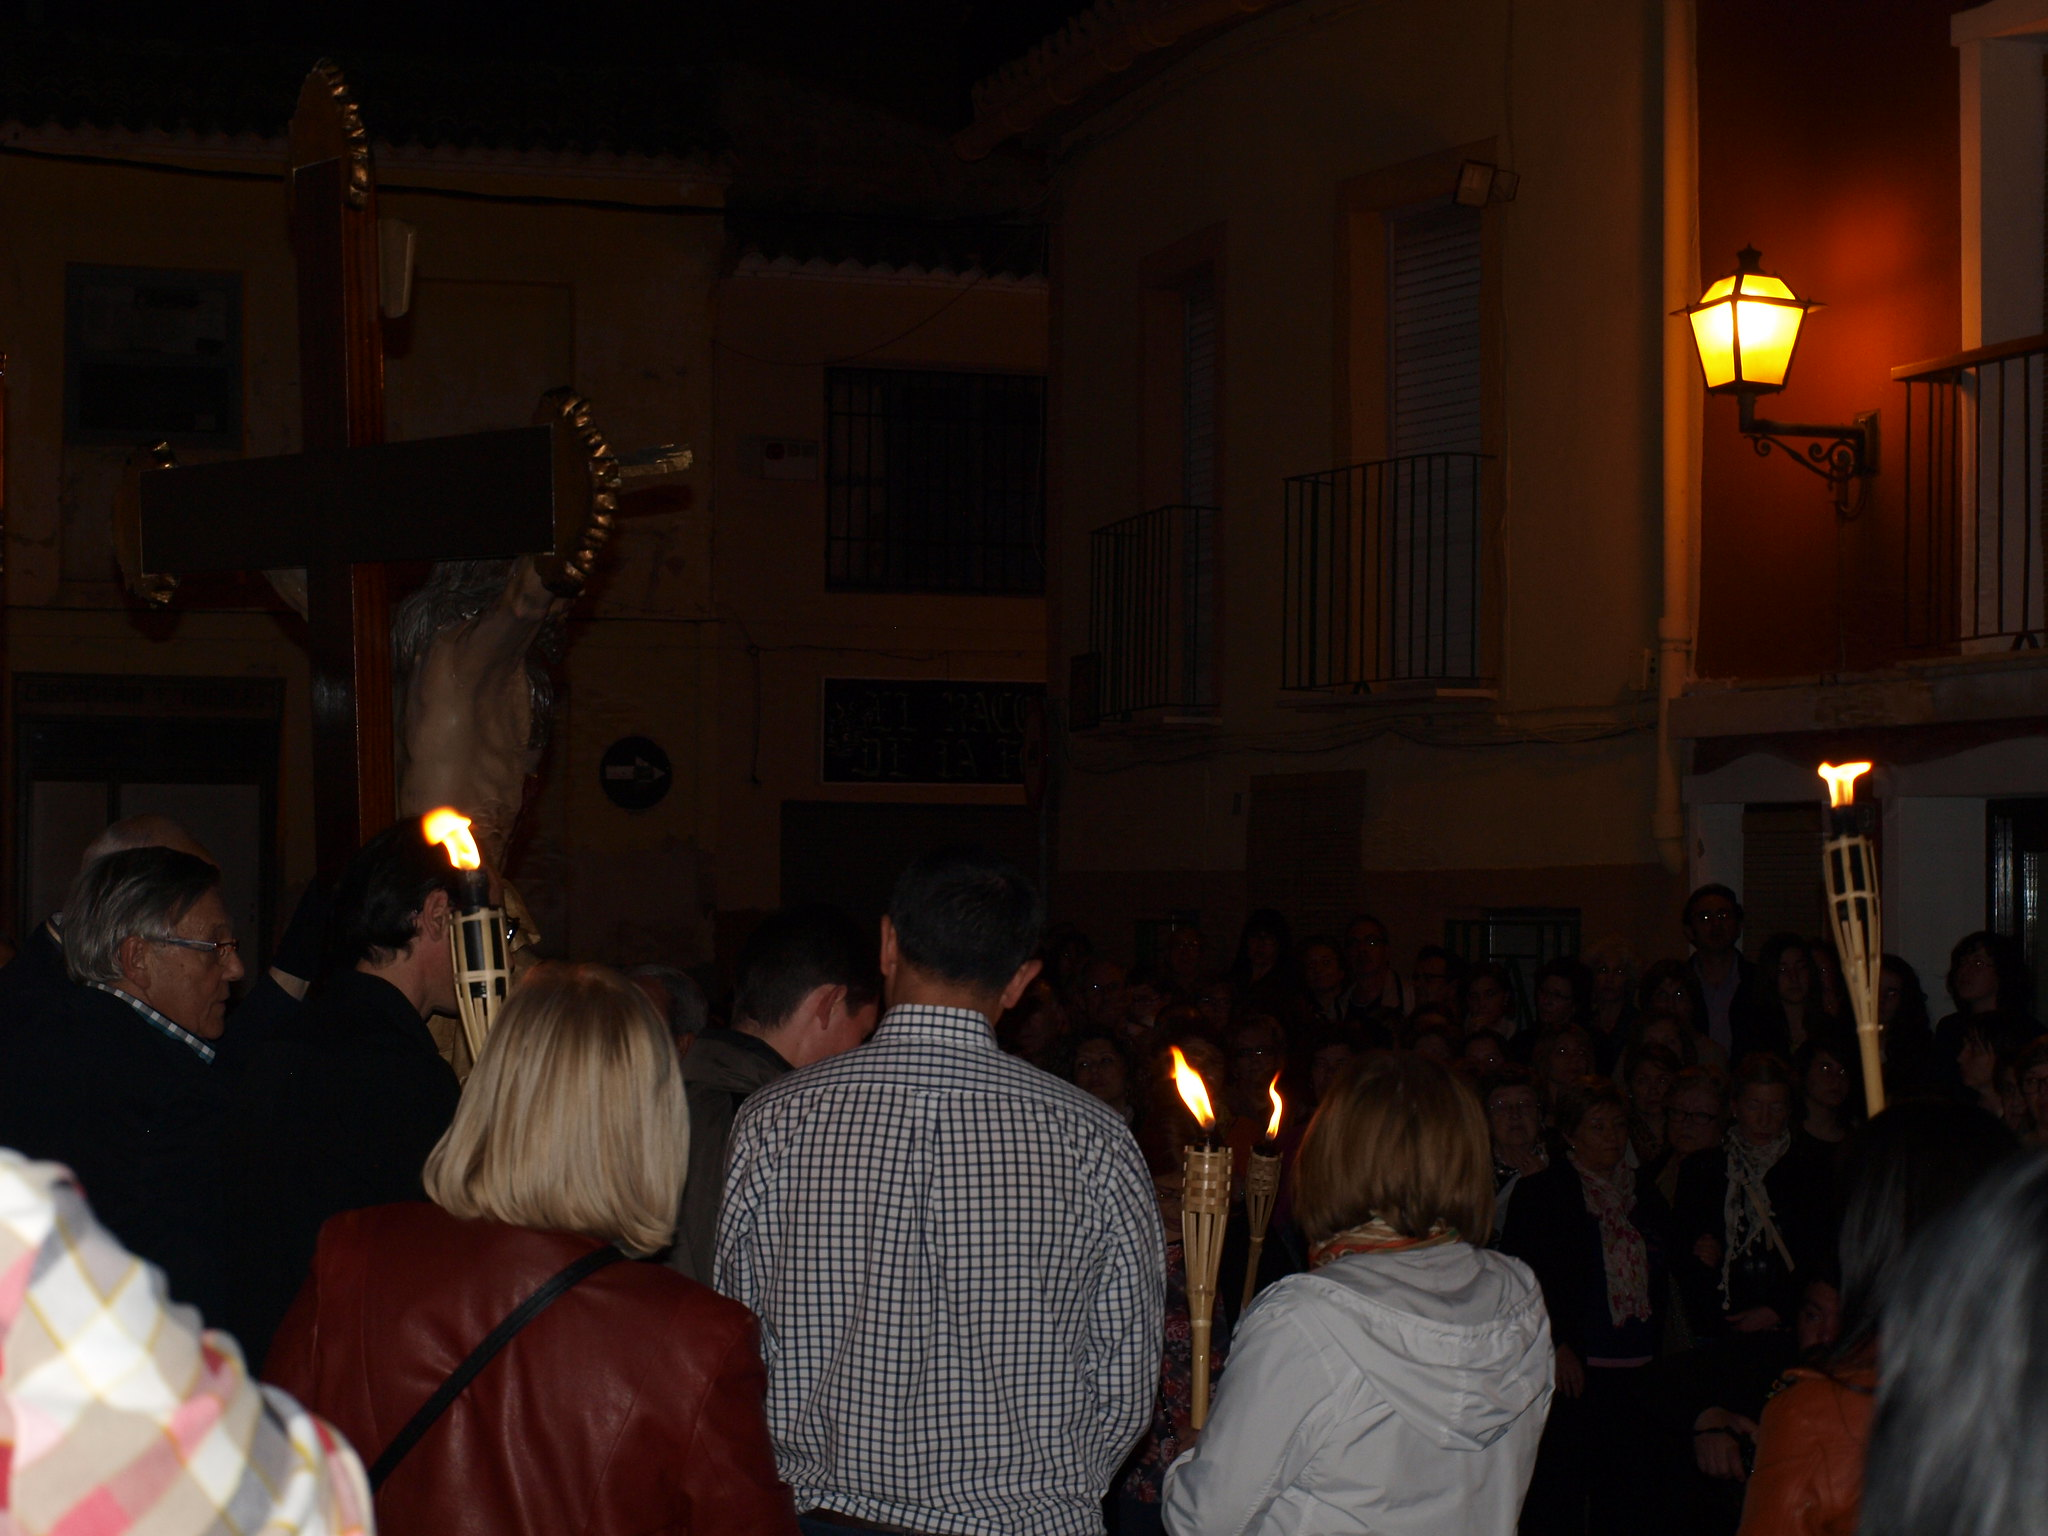 (2014-04-01) - V Vía Crucis nocturno - Paloma Romero Torralba (04)